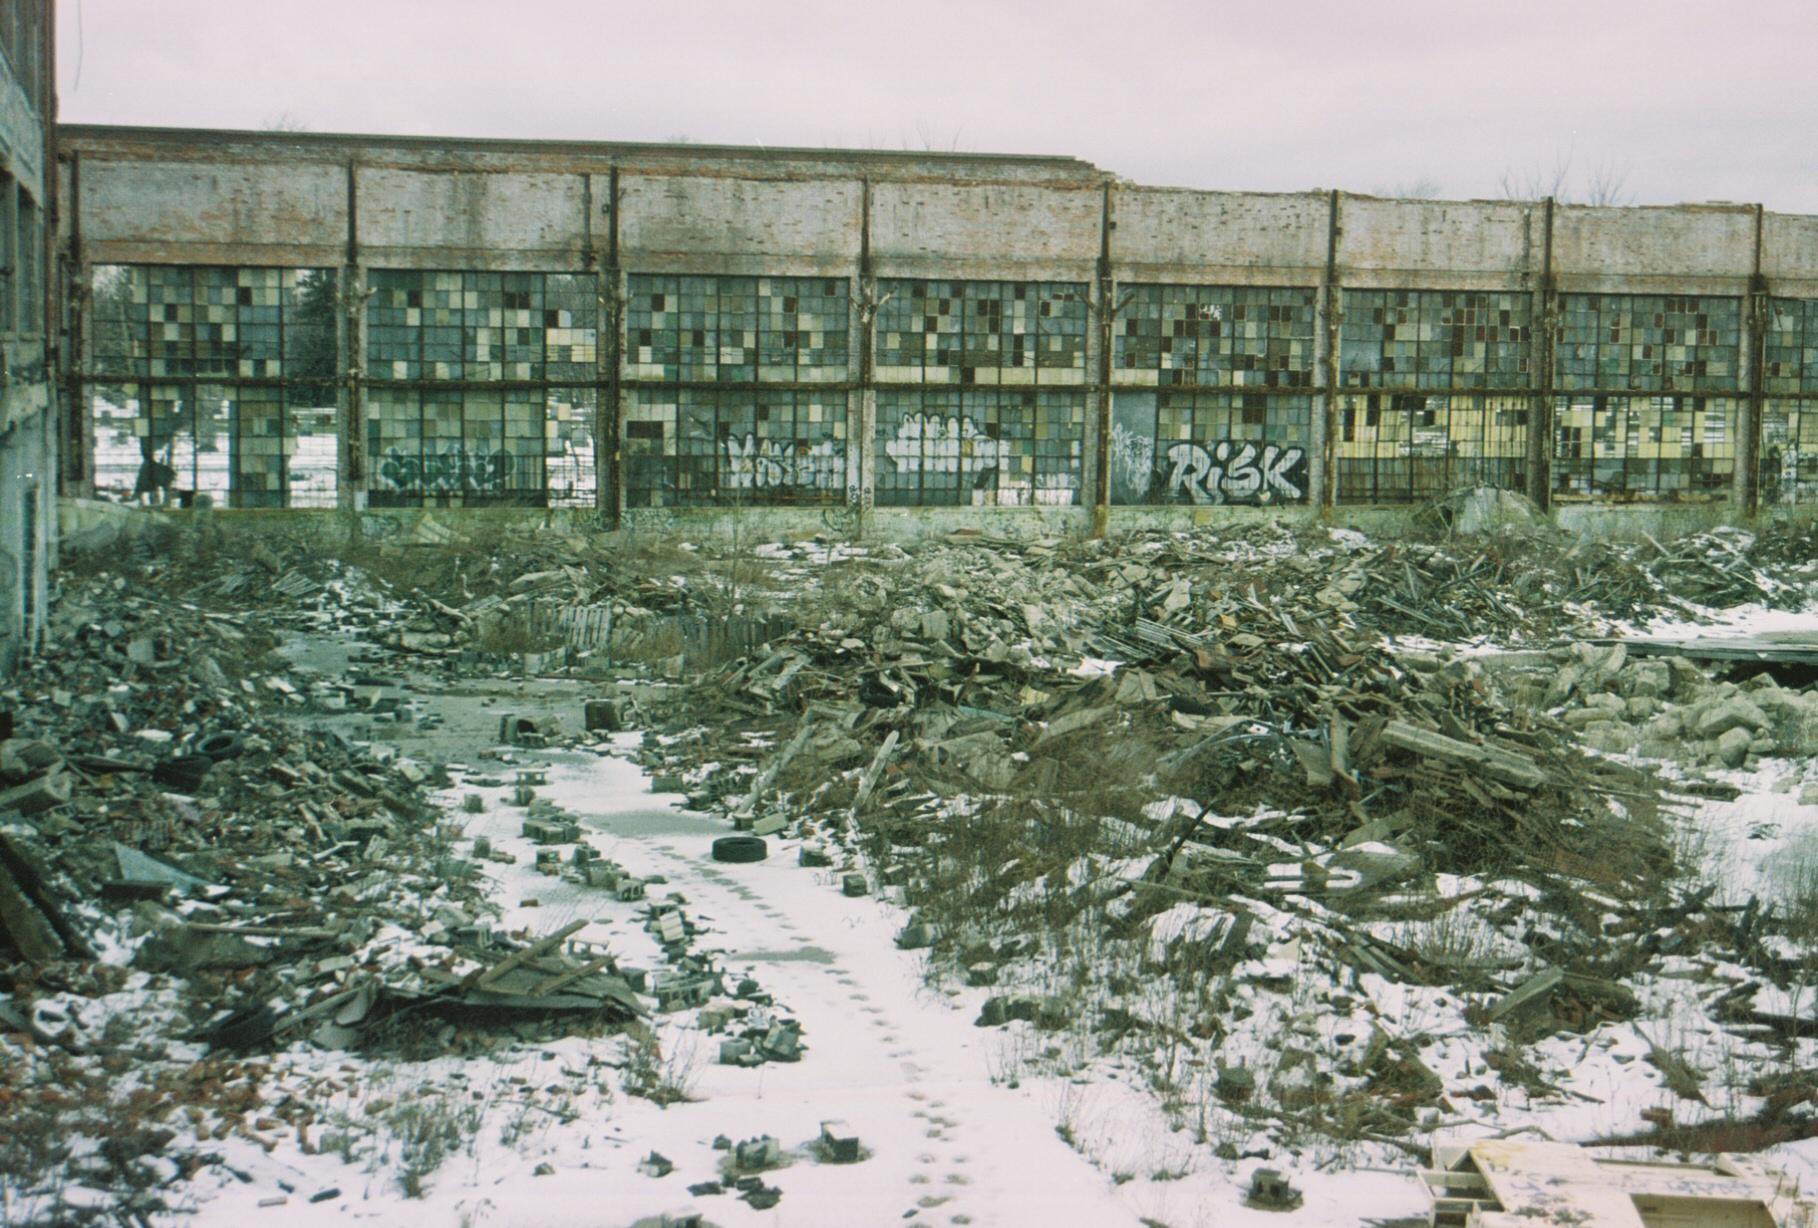 Abandoned Packard plant, Detroit.